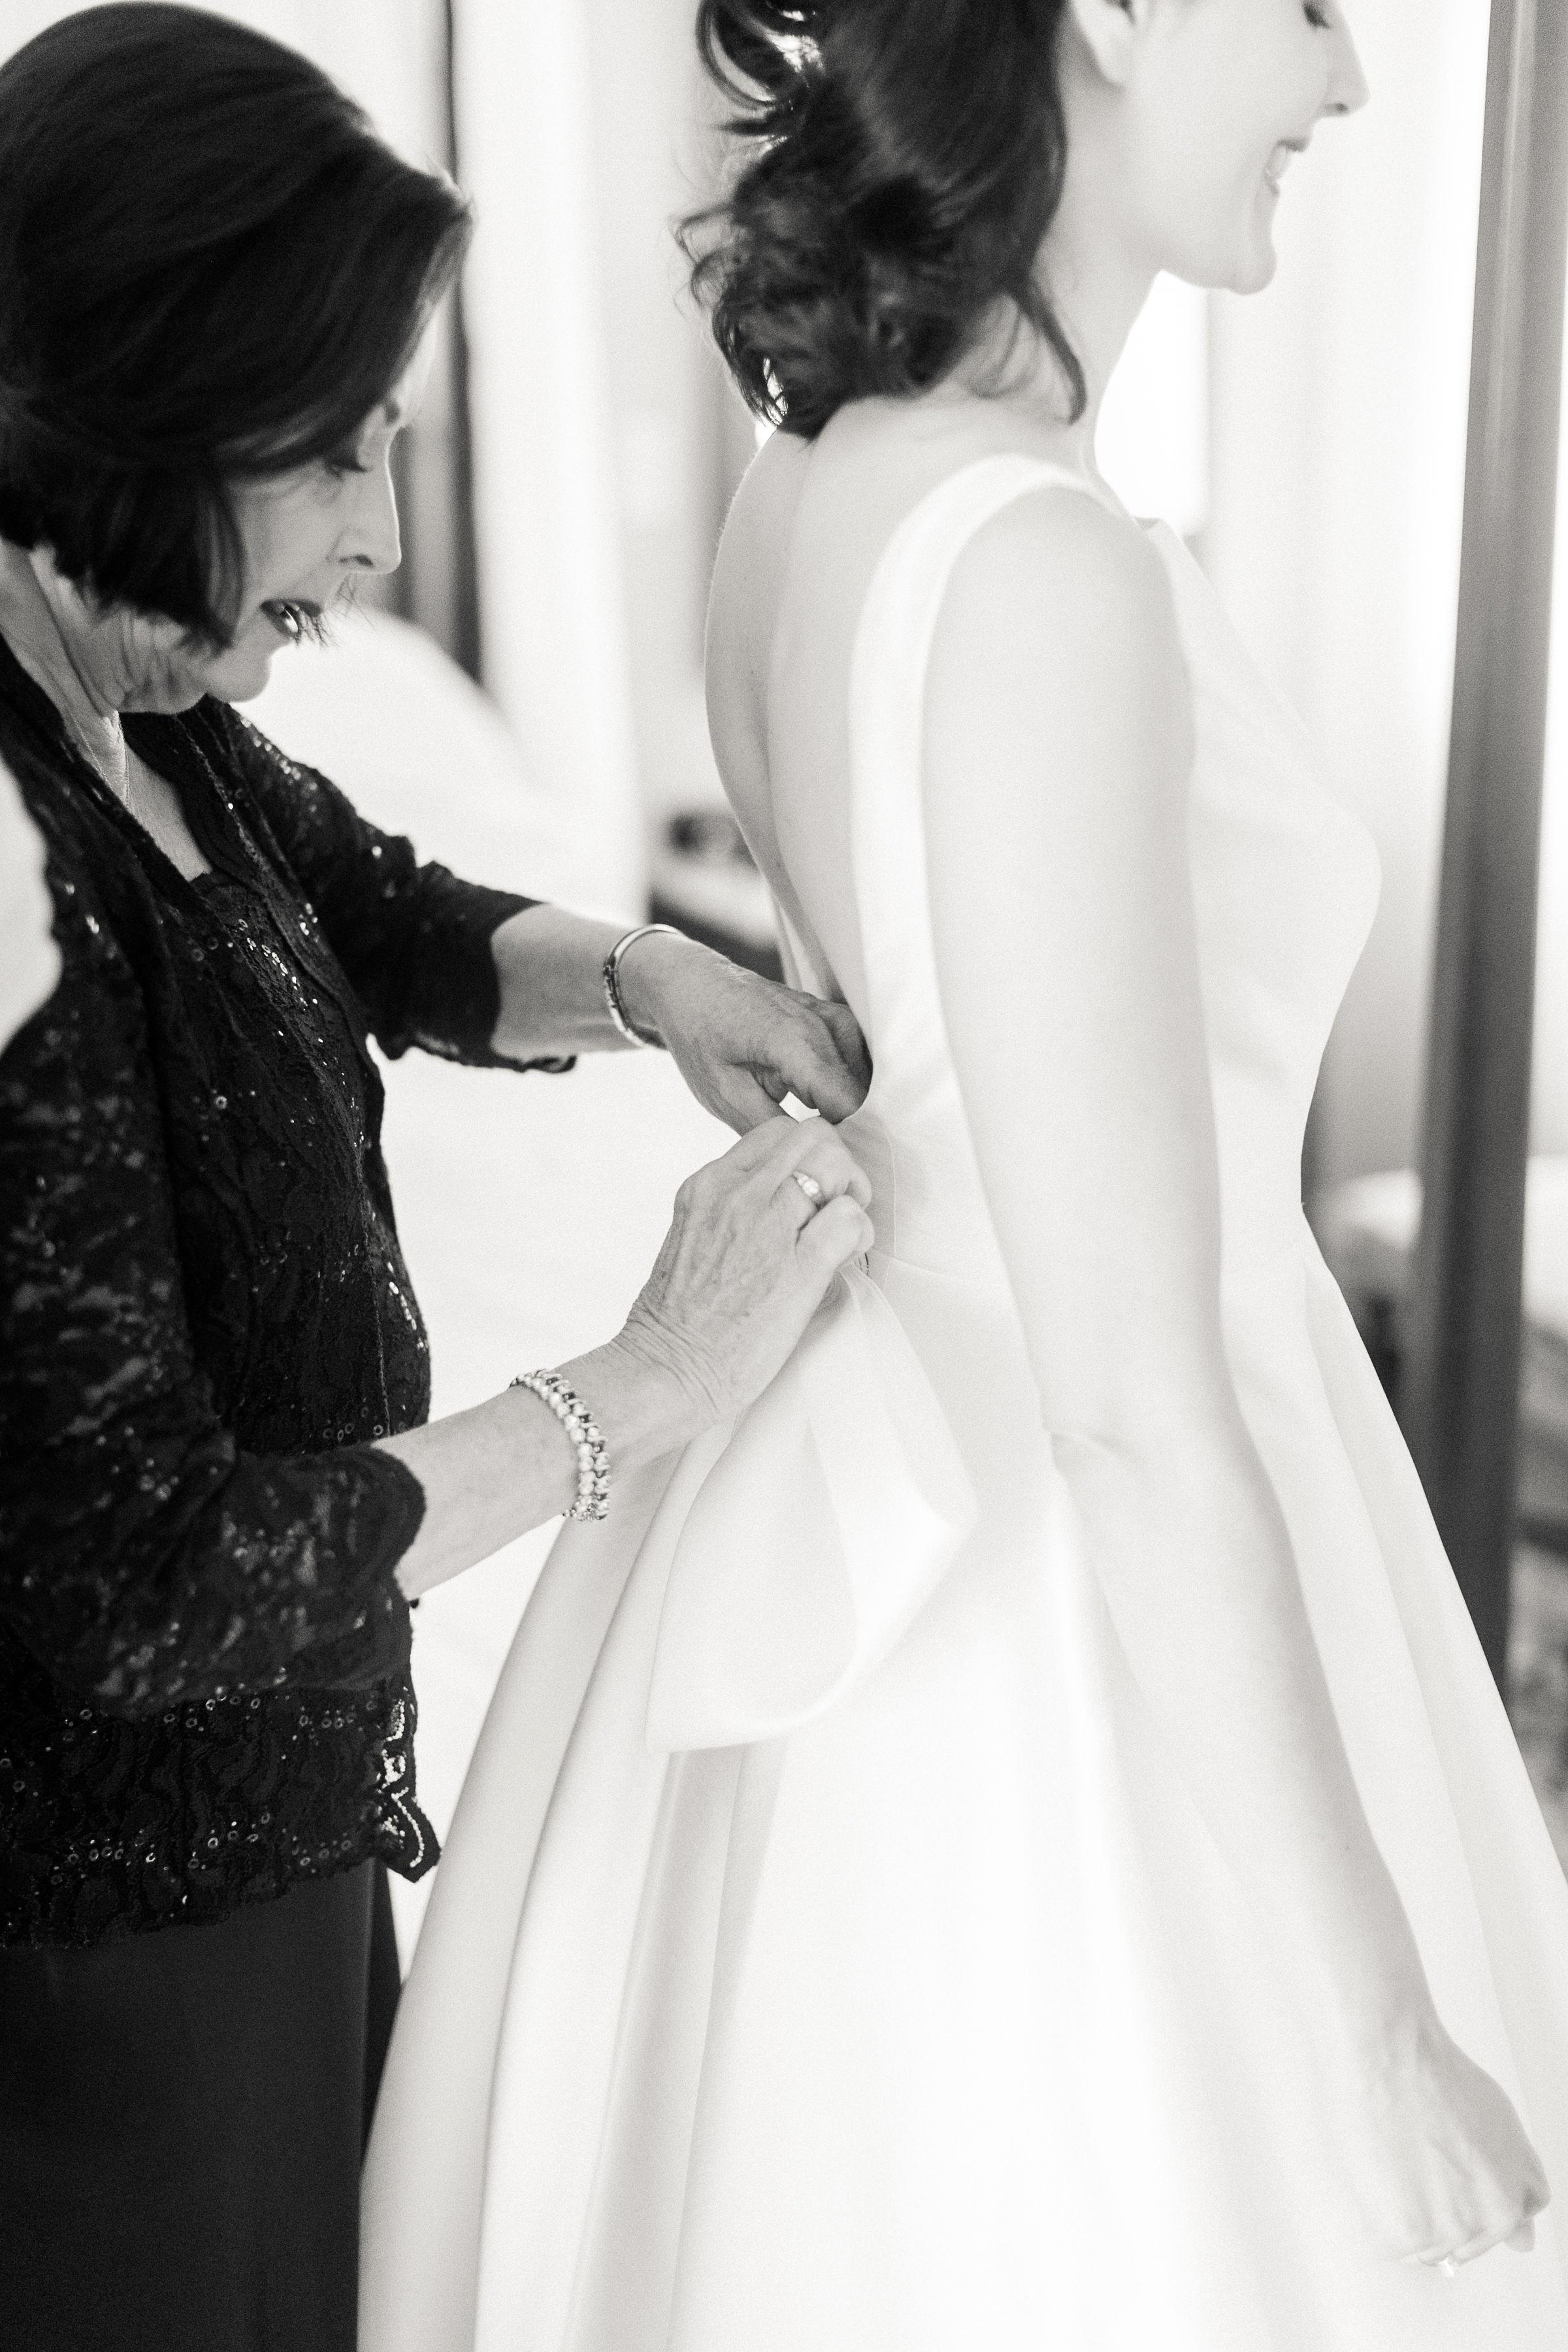 www.santabarbarawedding.com   Kiel Rucker Photography   The Ritz Carlton Bacara   Event of the Season   Sareh Nouri   Bride's Wedding Gown